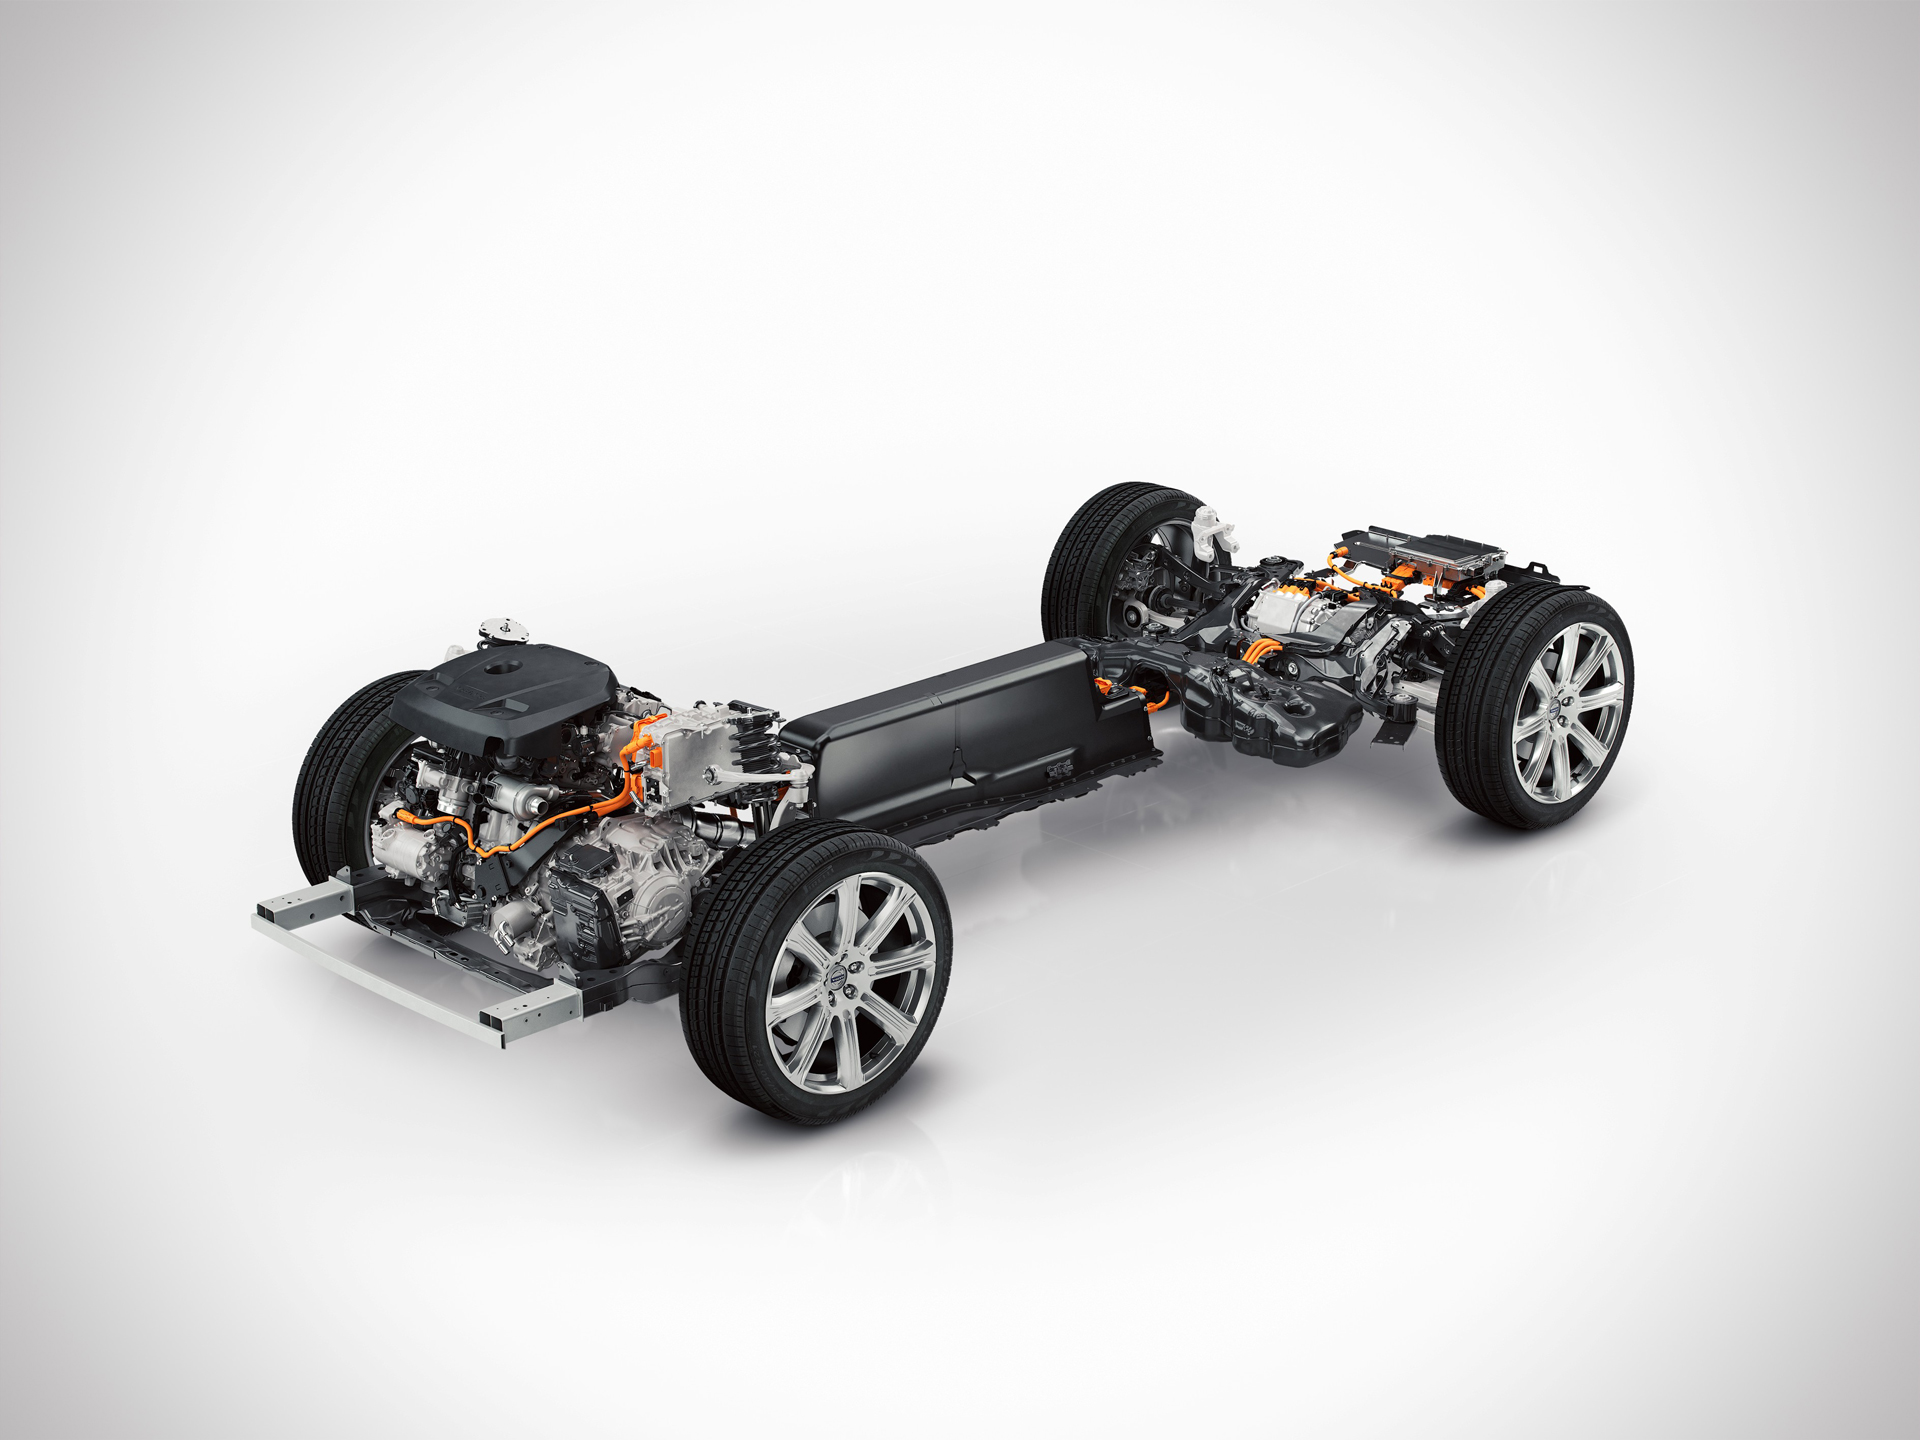 Volvo XC90 - Powertrain